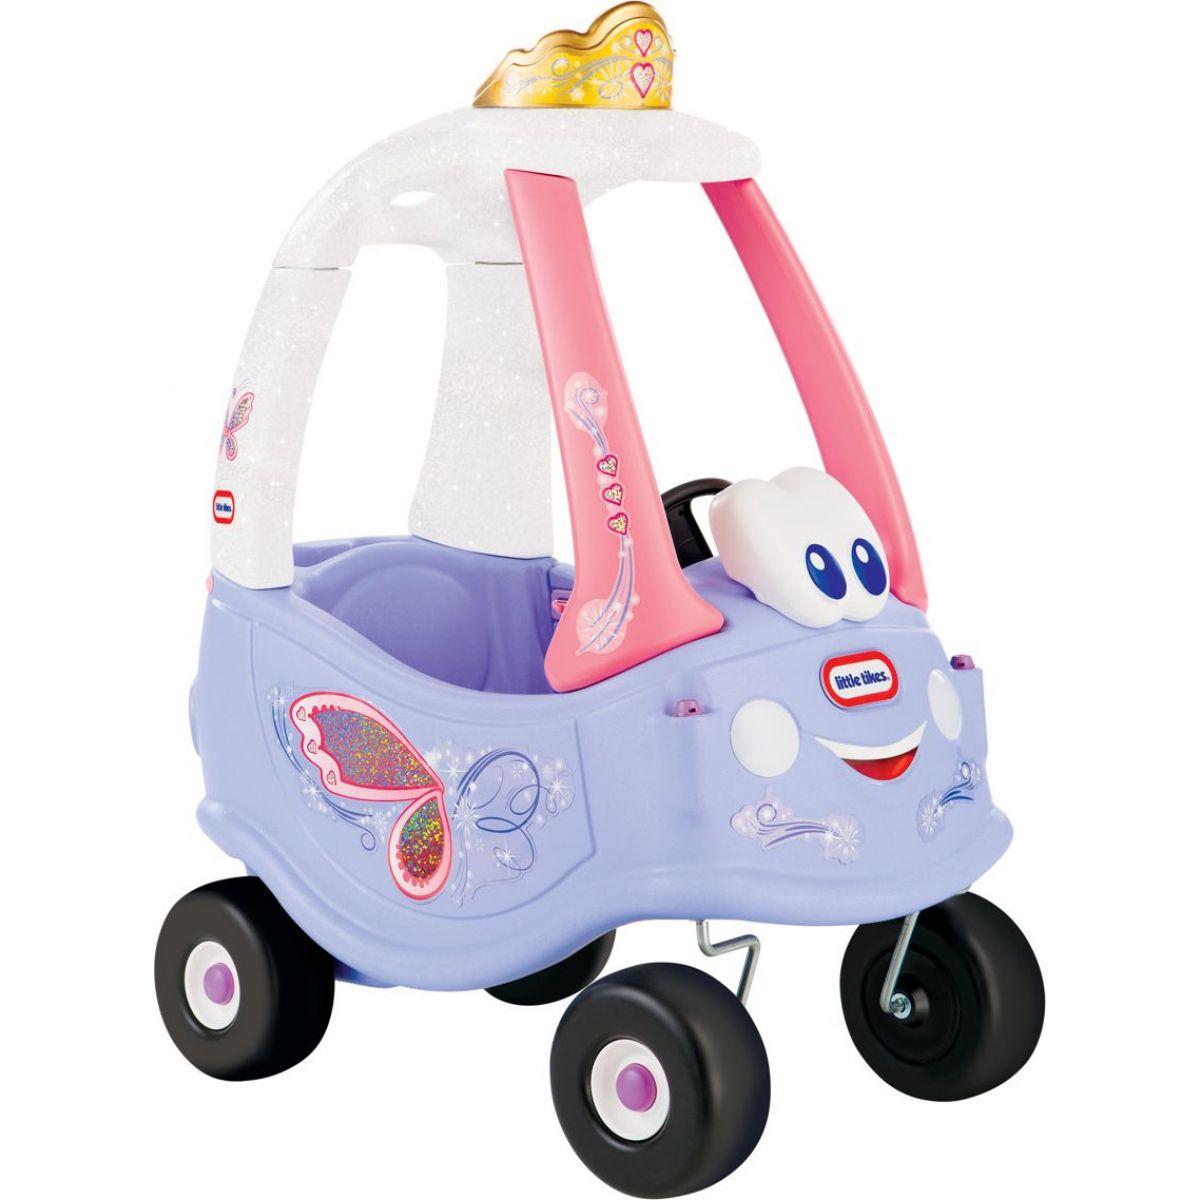 Little Tikes Fairy Cozy Coupe